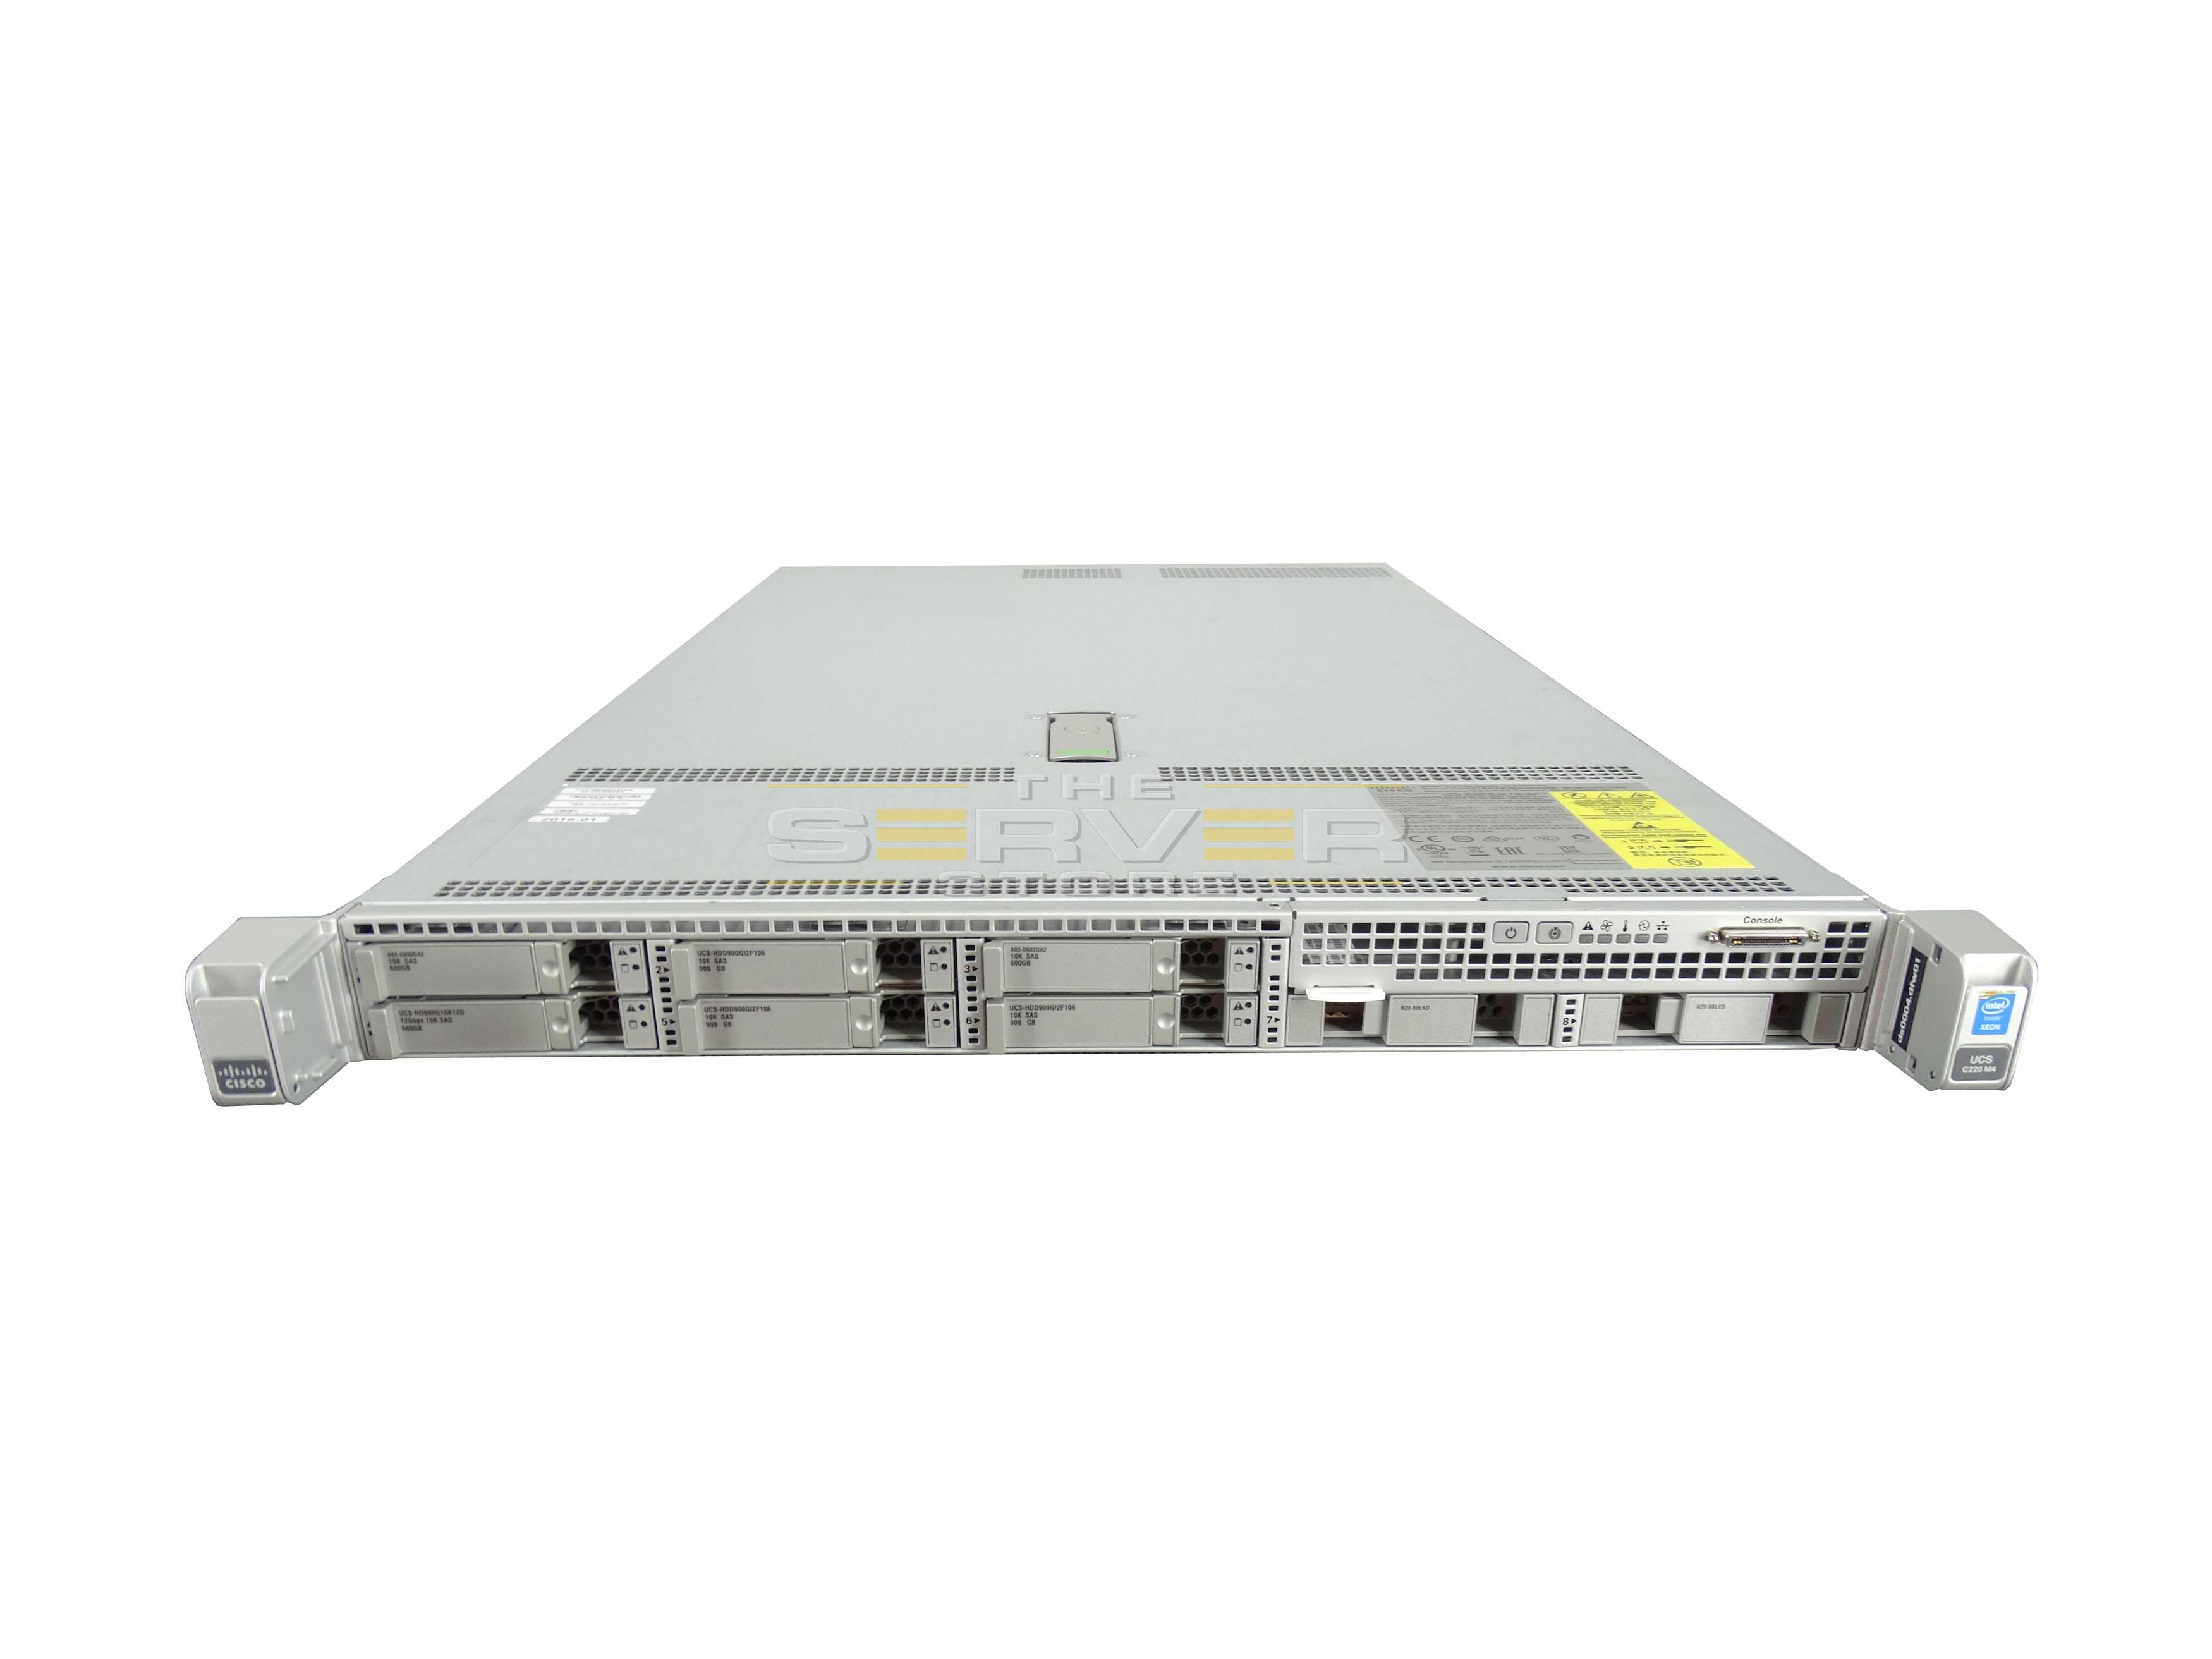 cisco ucs c220 m4 8x sff 1u rack mount server